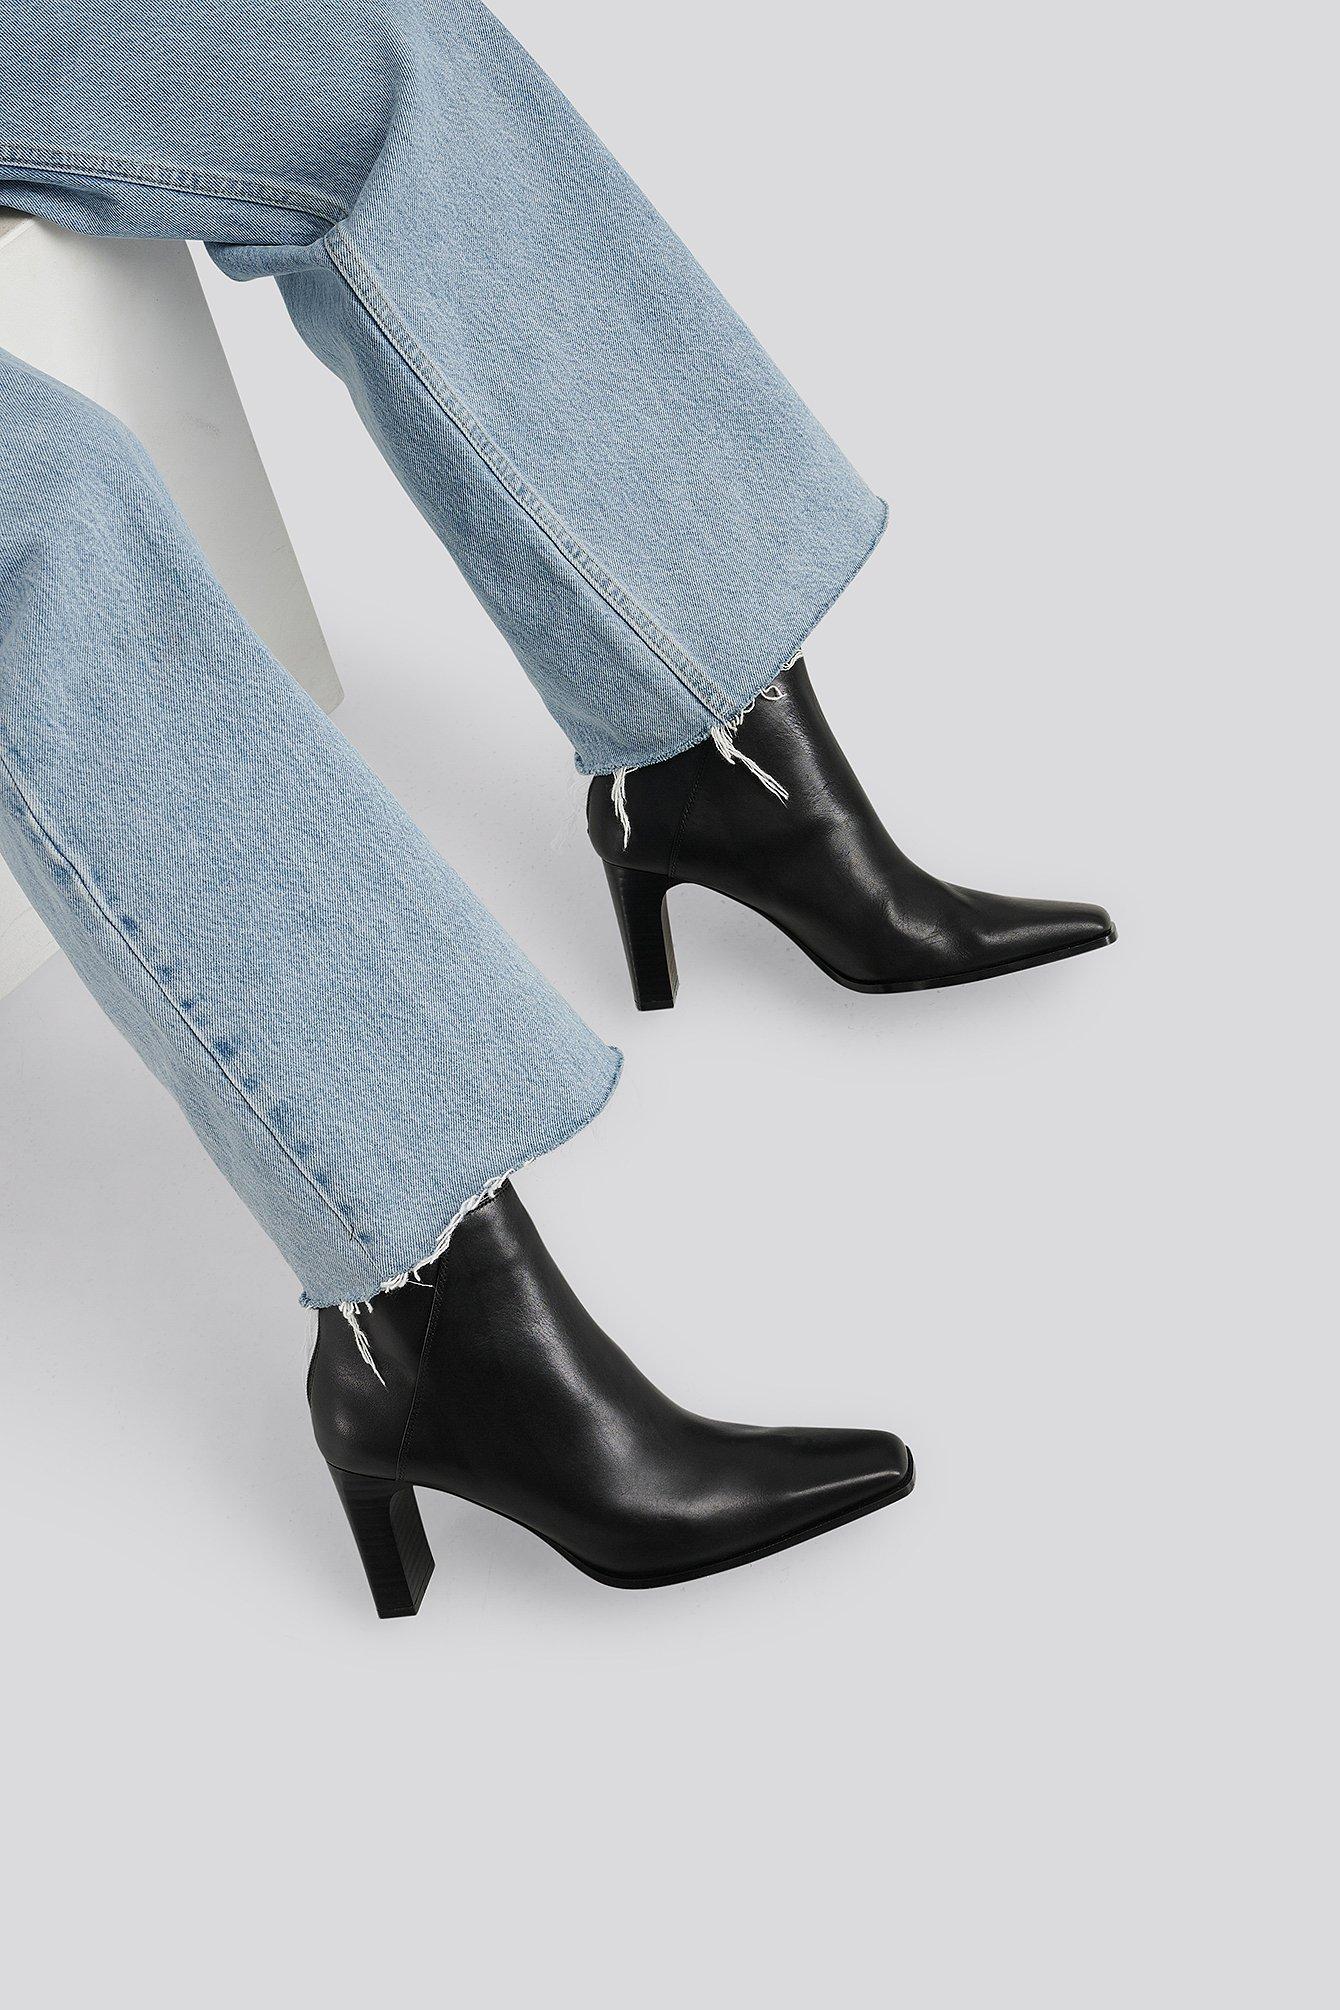 MANGO Bell Ankle Boots - Black | Schuhe > Stiefeletten > Ankleboots | Mango